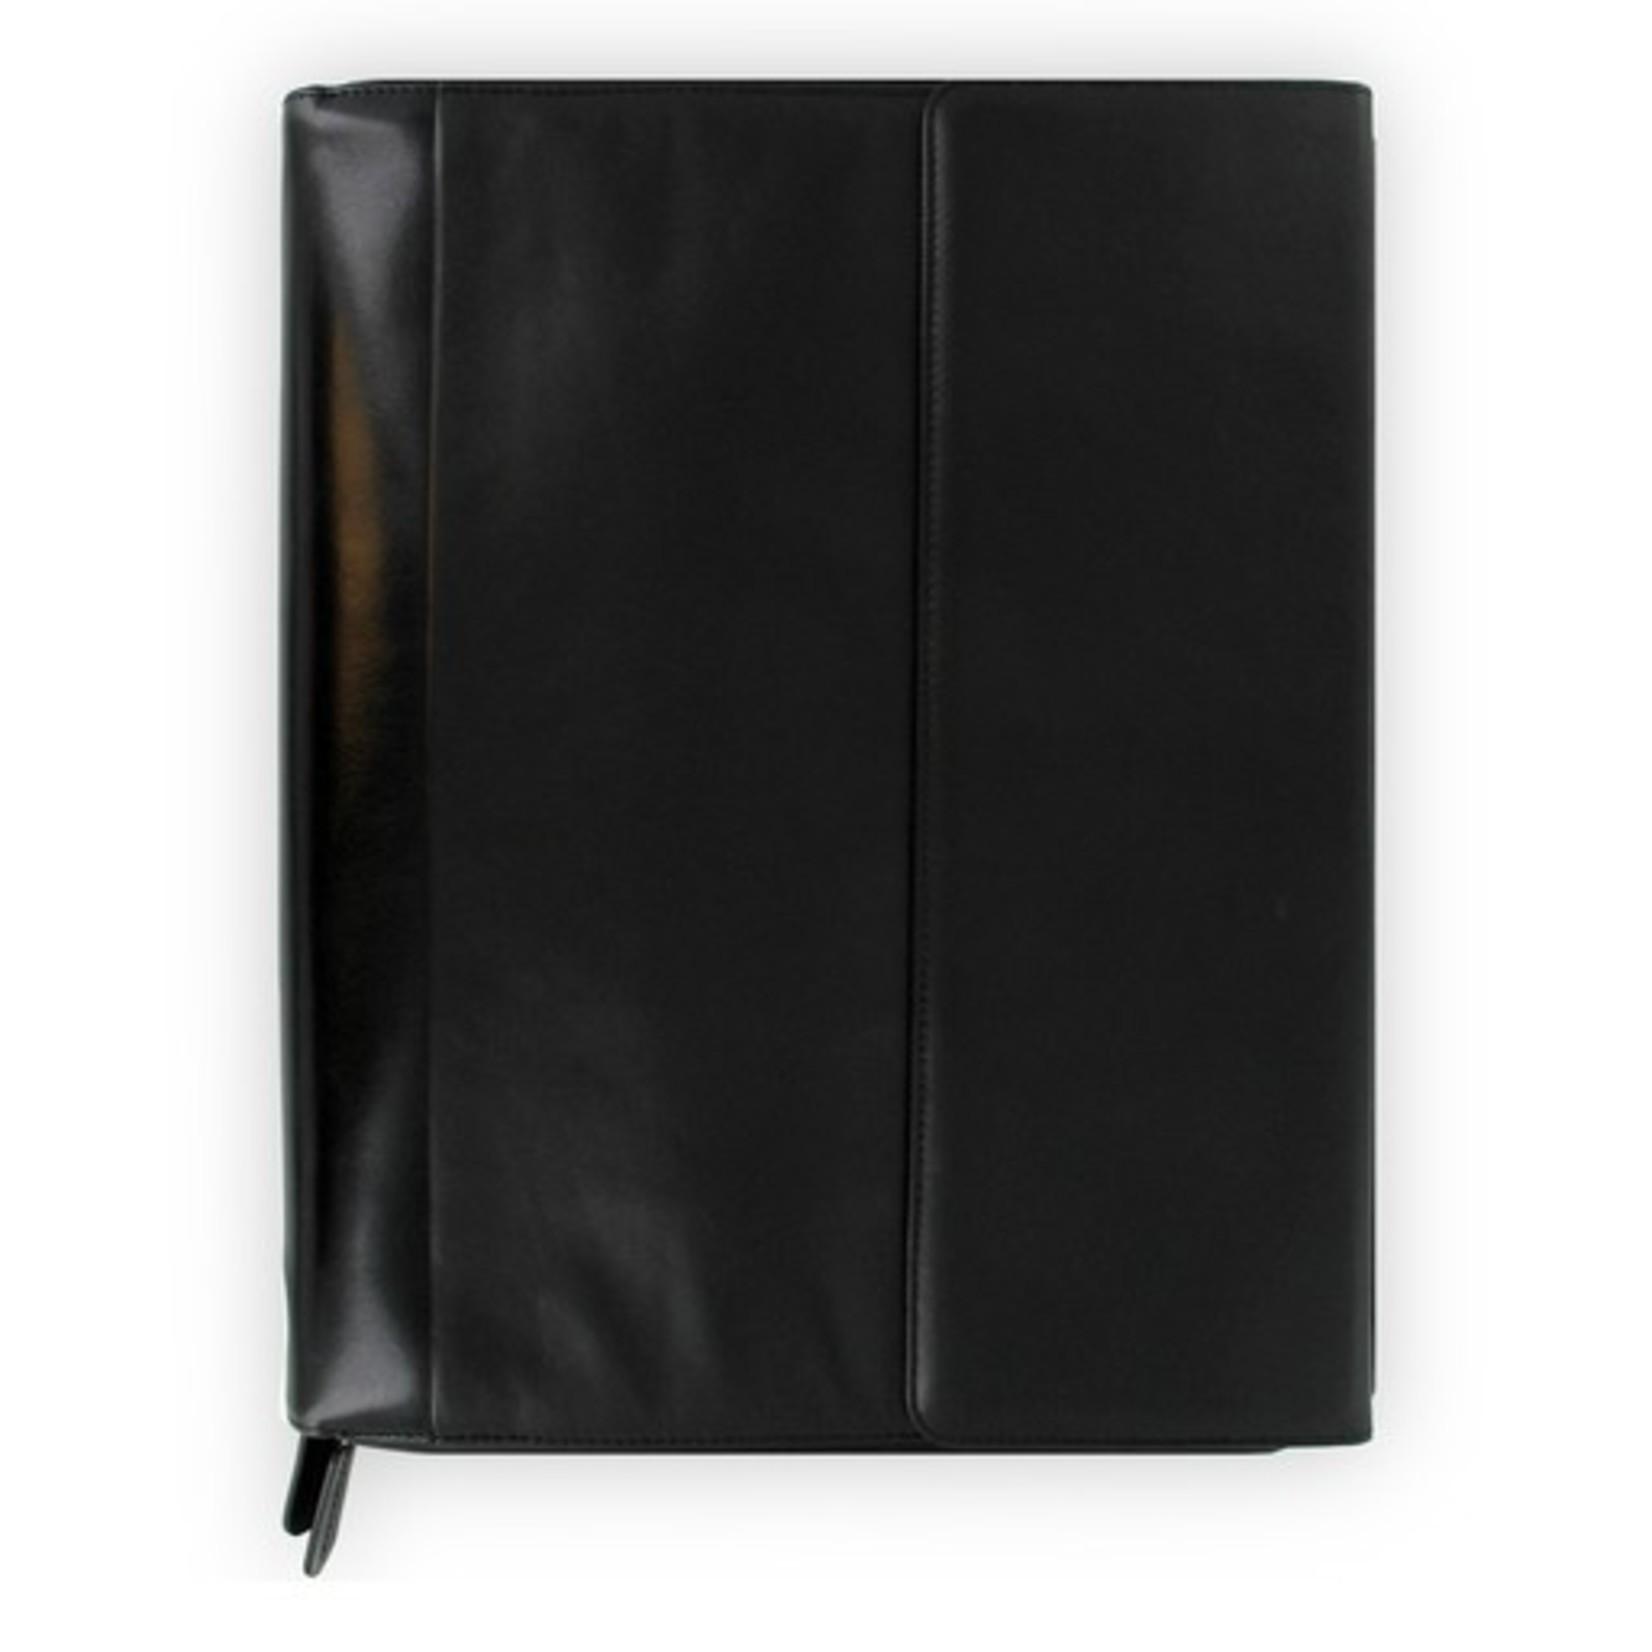 Filofax Filofax Nappa A4, Zipped Folder, black